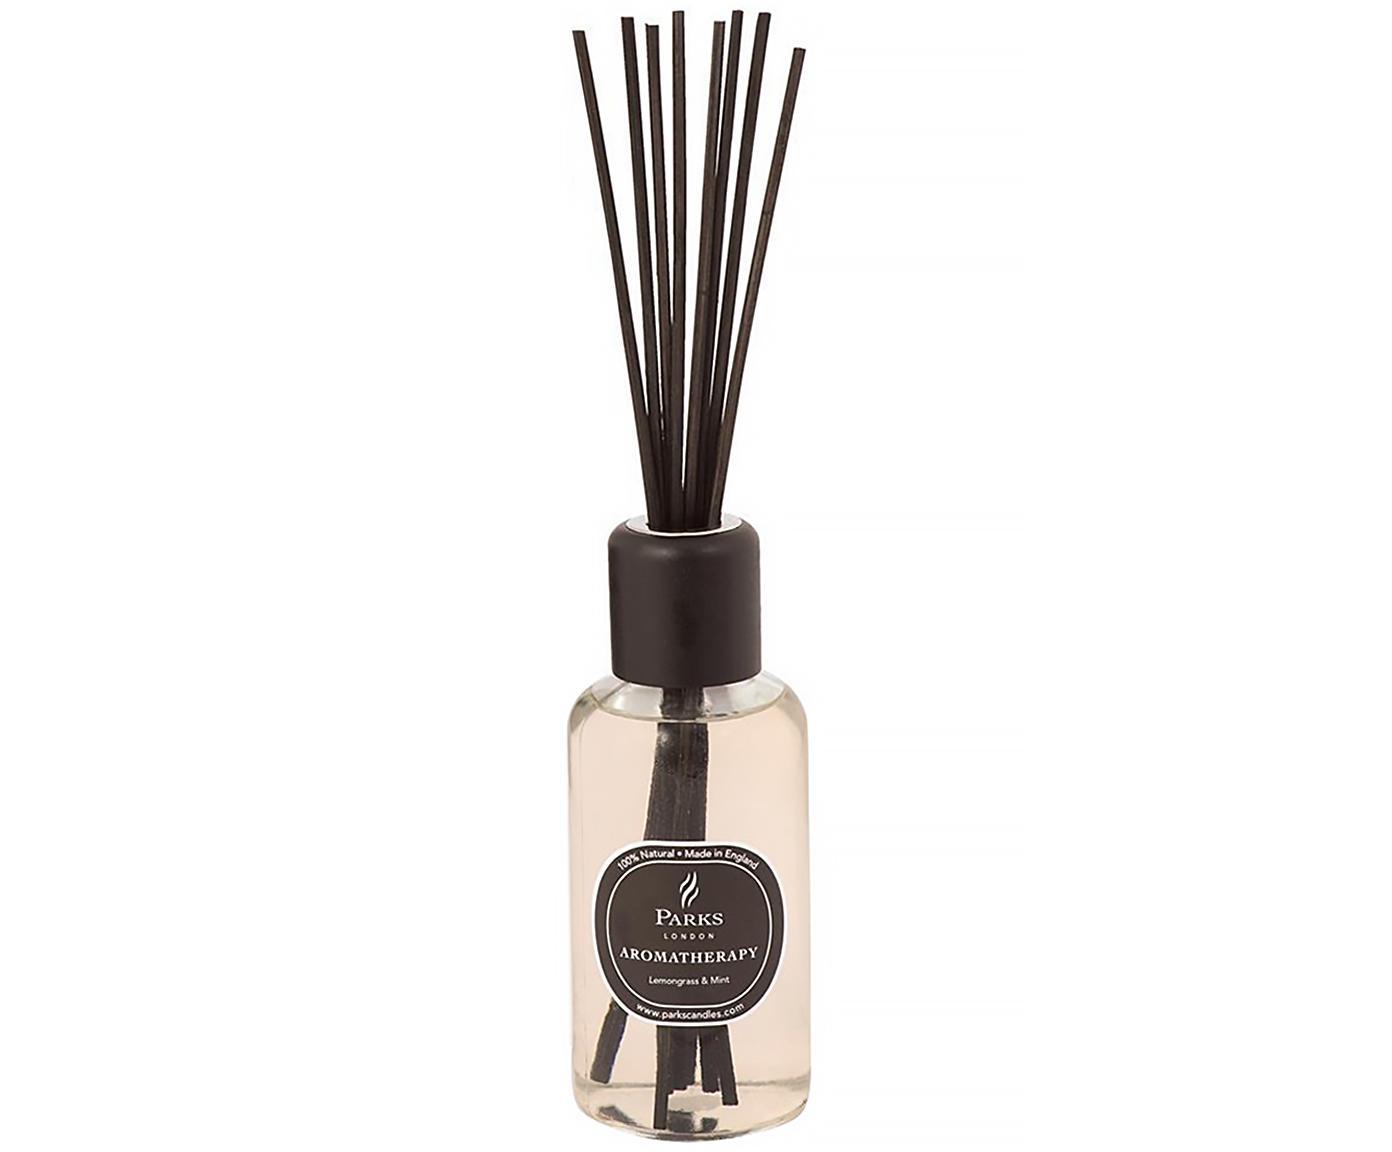 Diffuser Aromatherapy (citroengras & munt), Houder: glas, Sluiting: hout, Transparant, wit, zwart, Ø 6 x H 14 cm